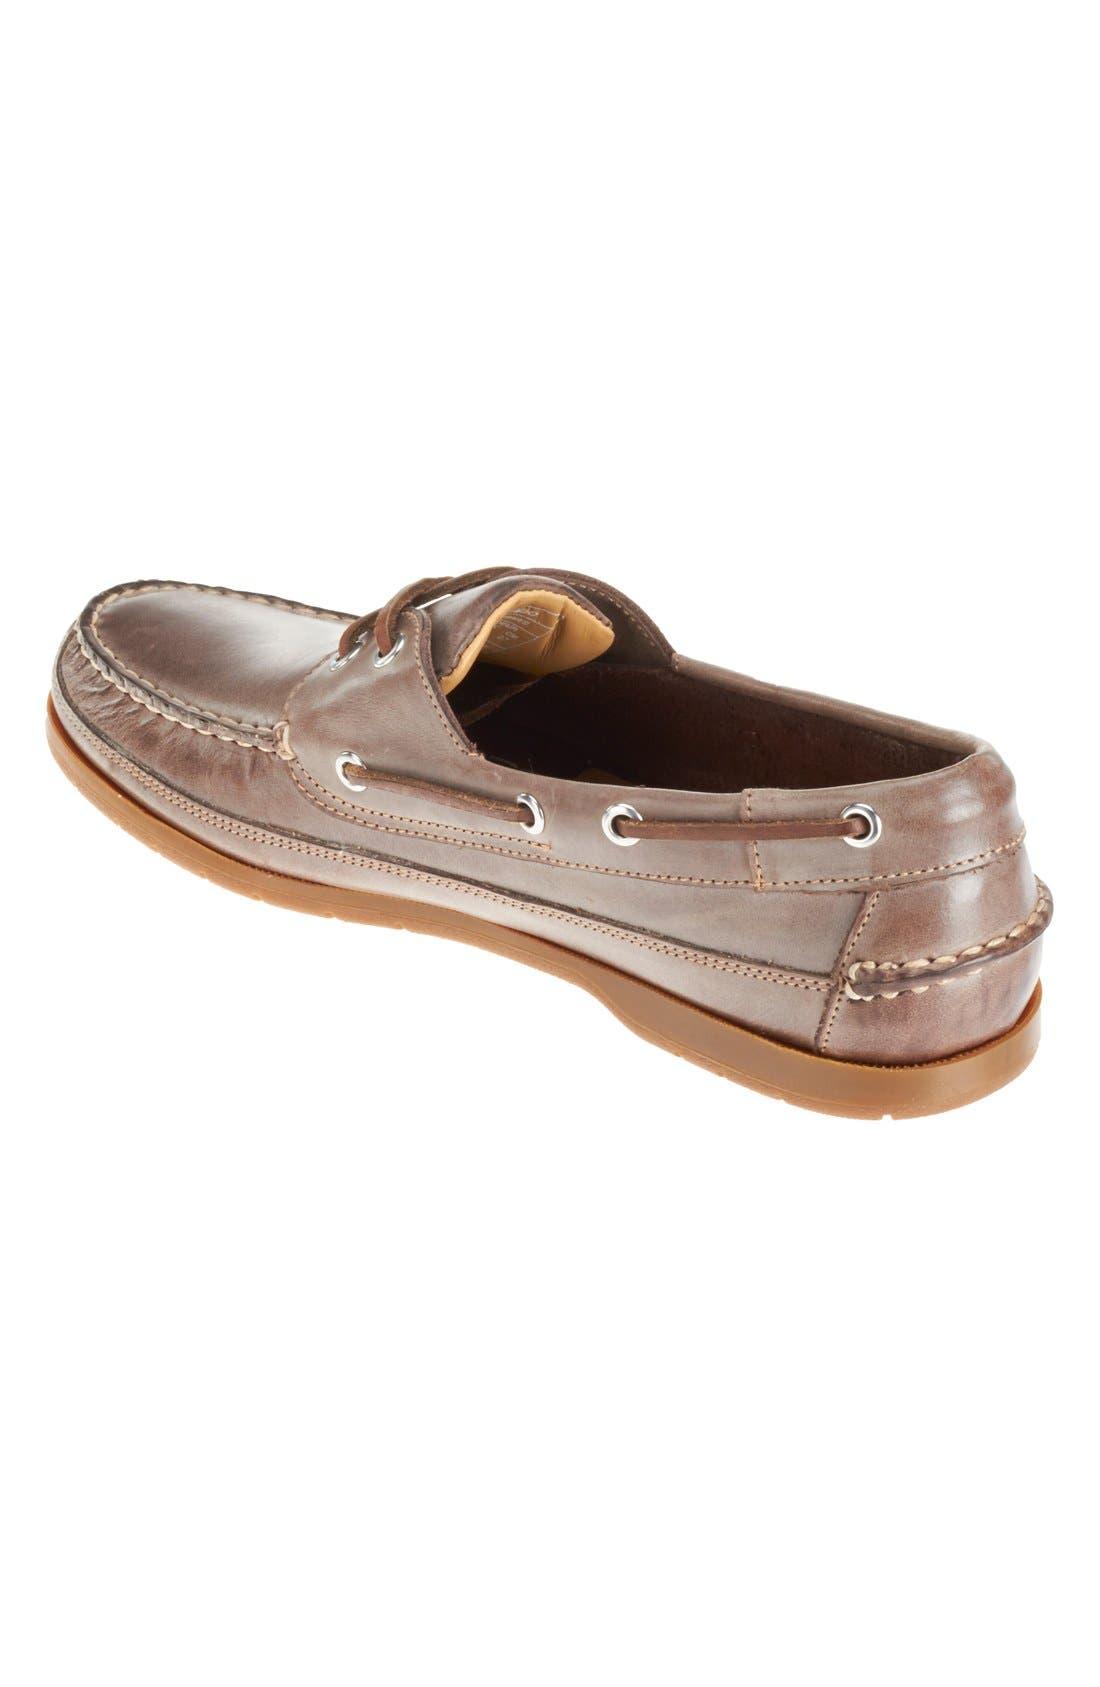 'Schooner' Boat Shoe,                             Alternate thumbnail 28, color,